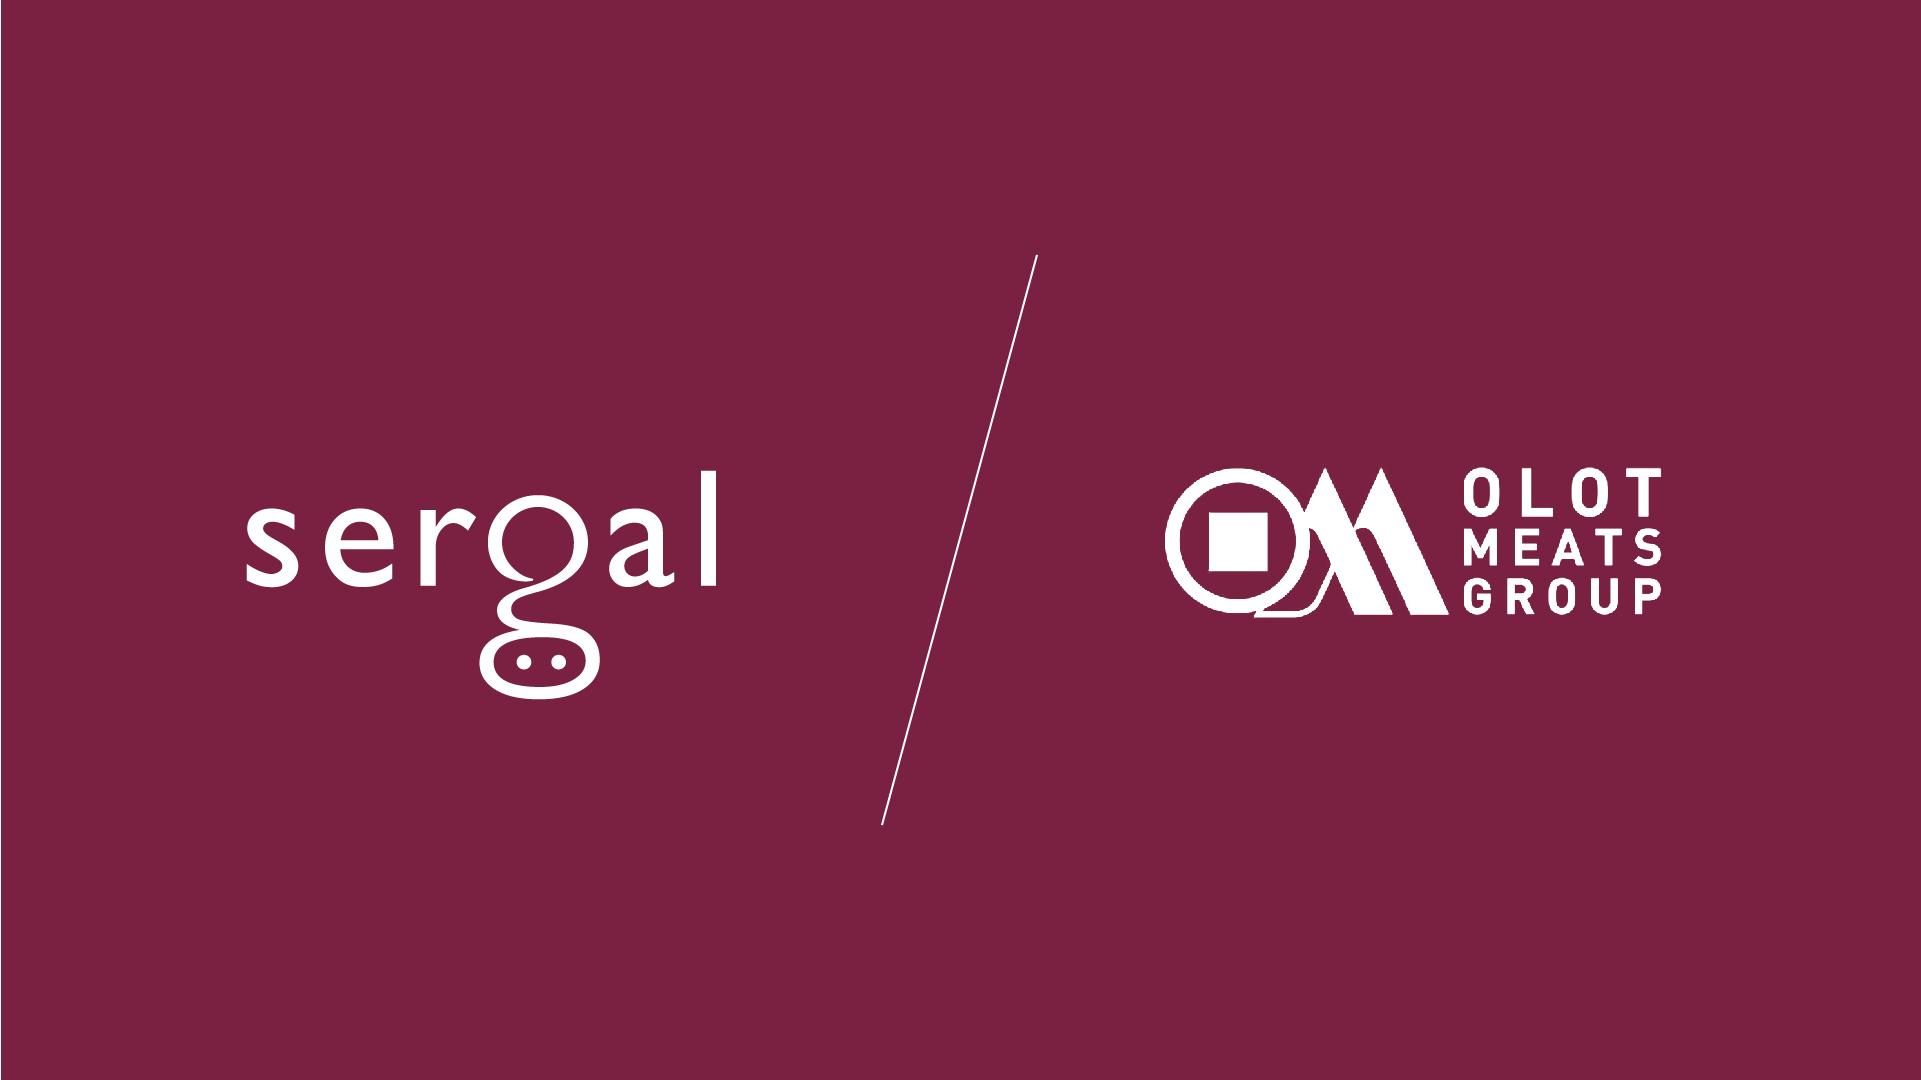 Acord Sergal i Olot Meats Group